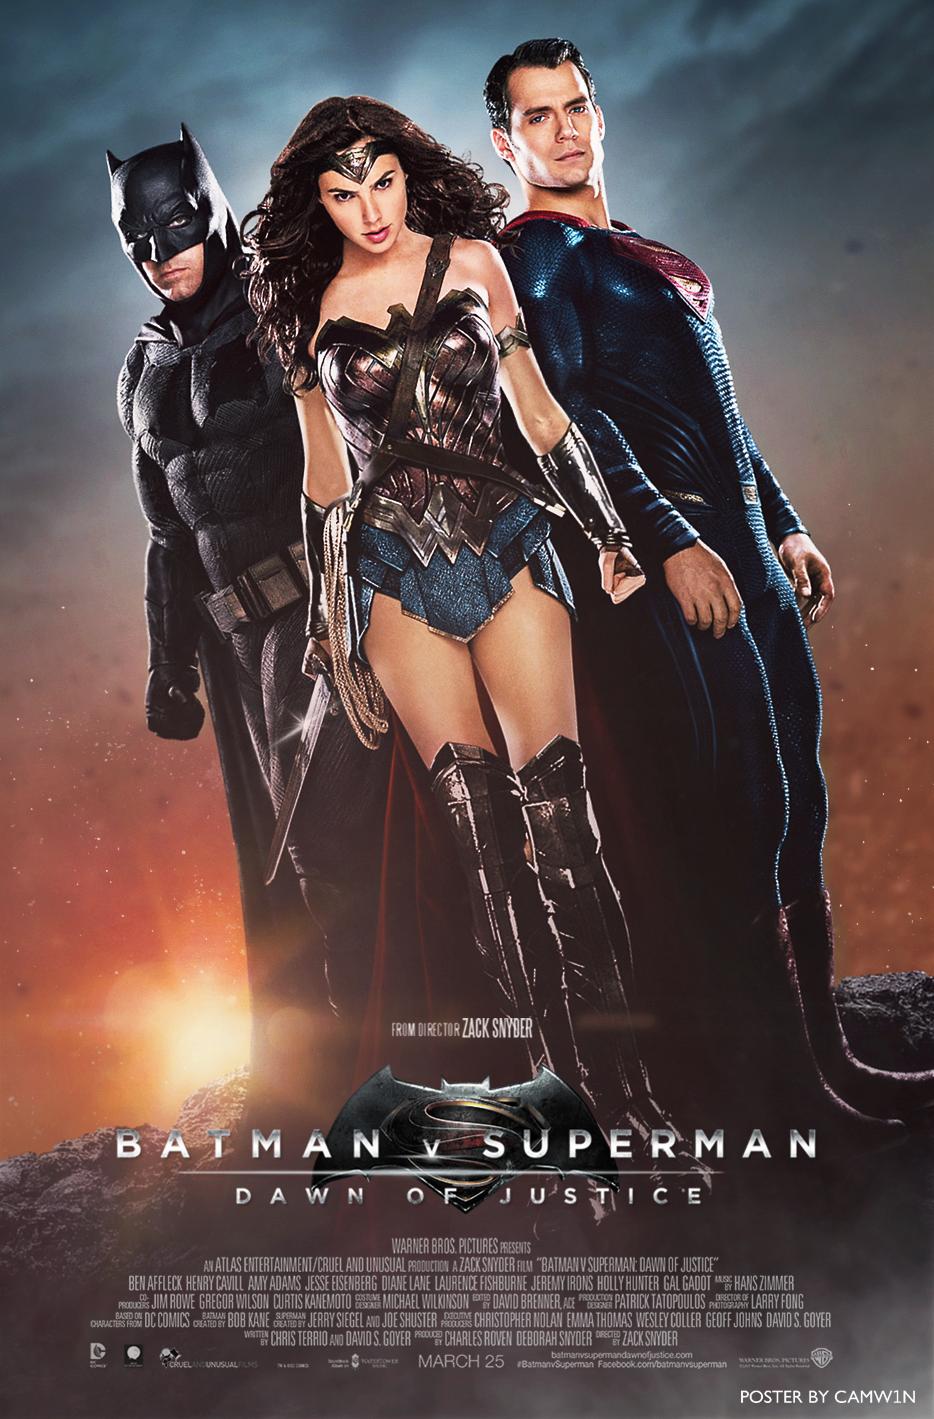 Batman V Superman - Trinity Poster A by CAMW1N